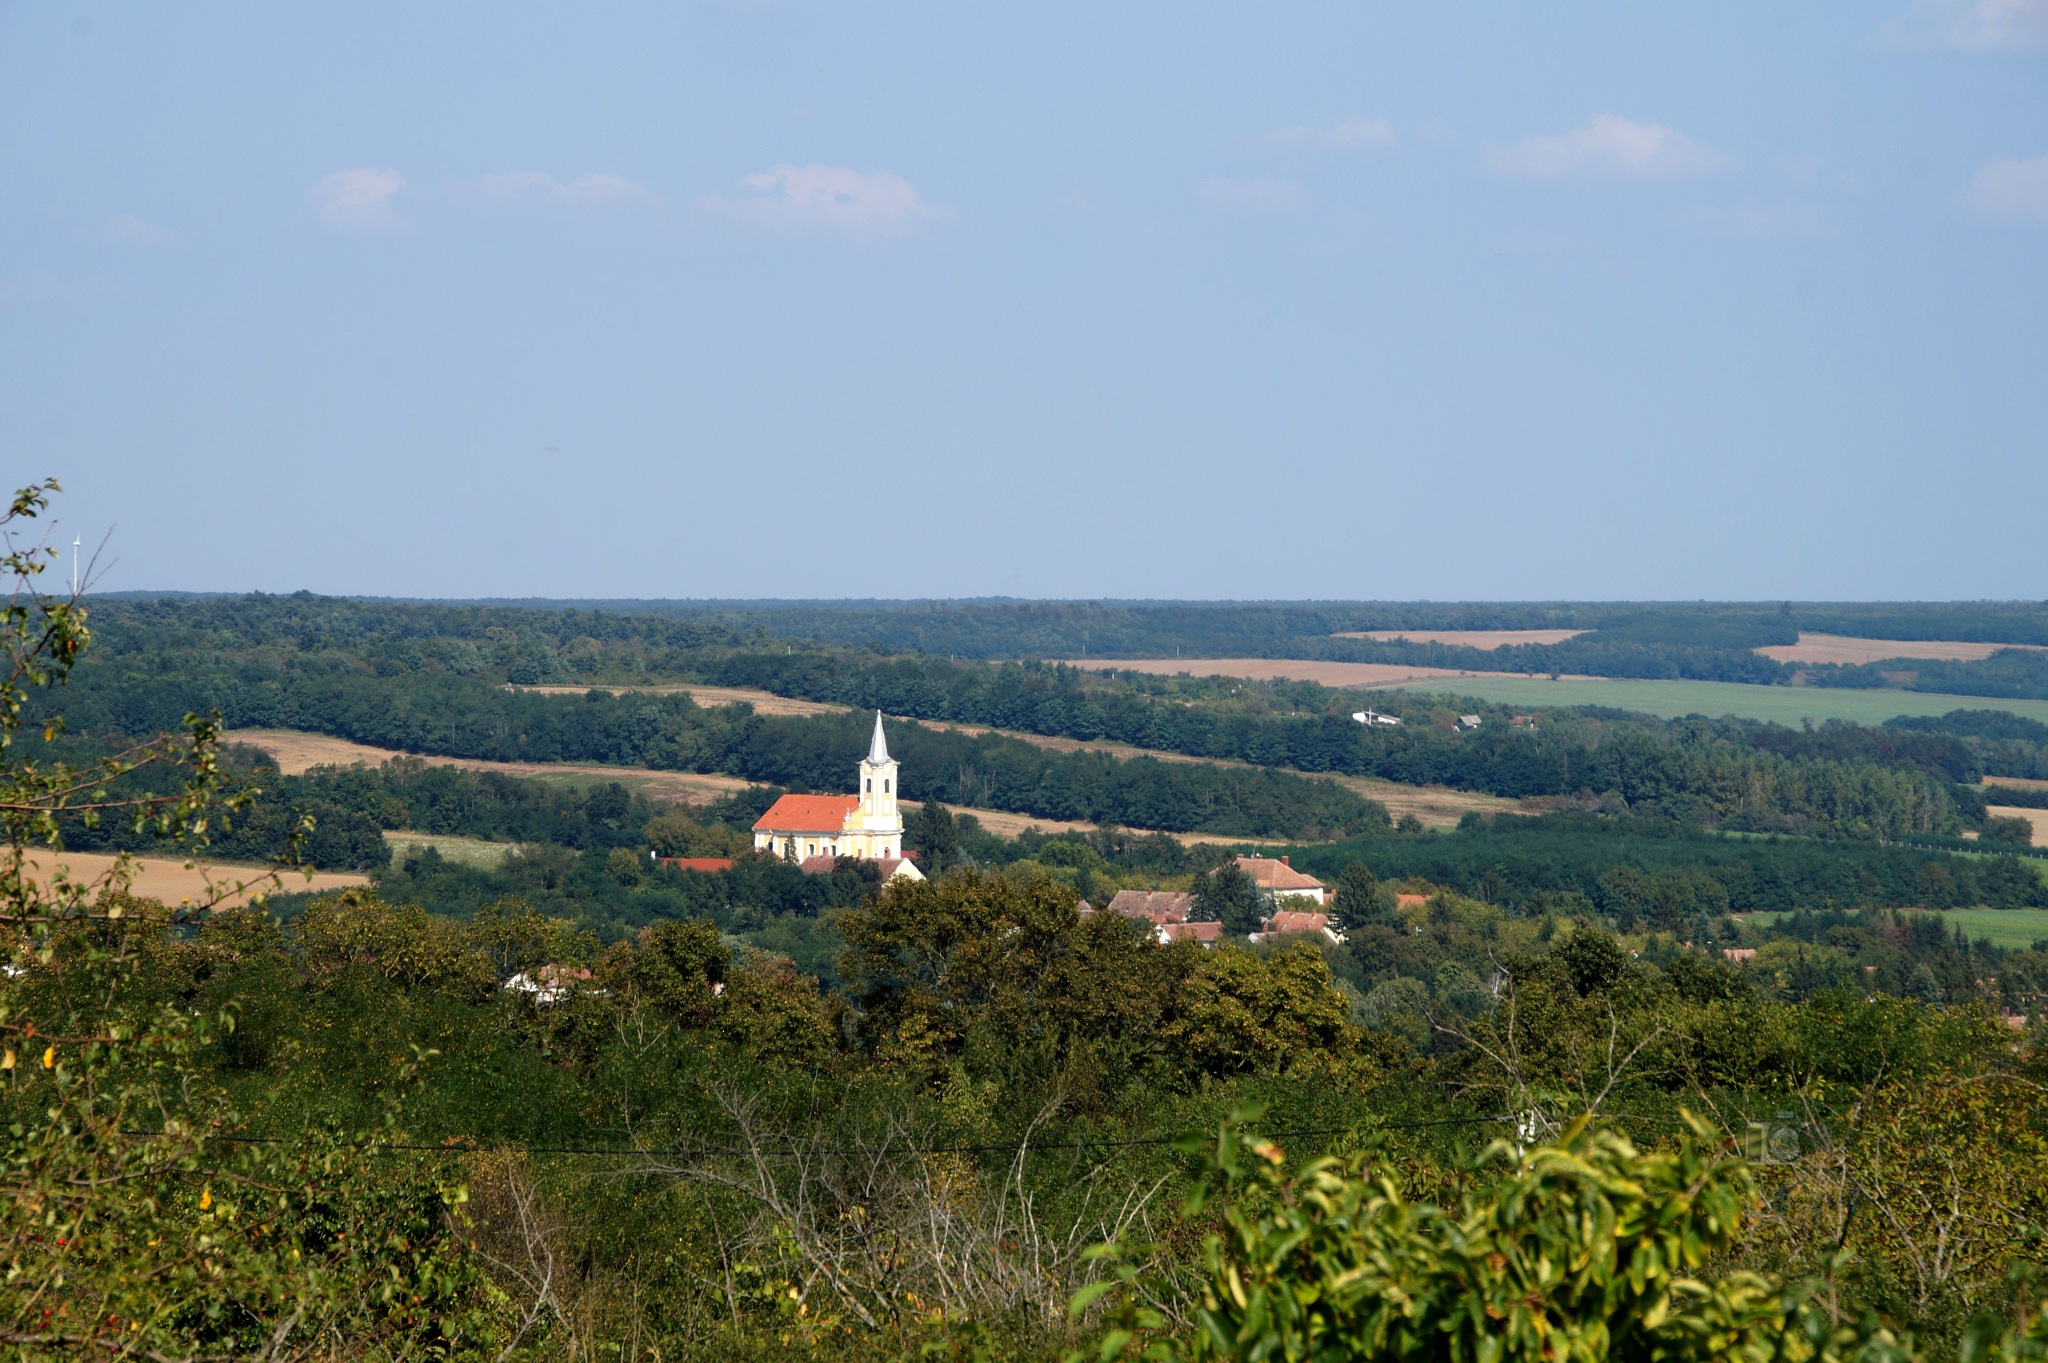 Sep.14, landscape with church by hunyadigeza